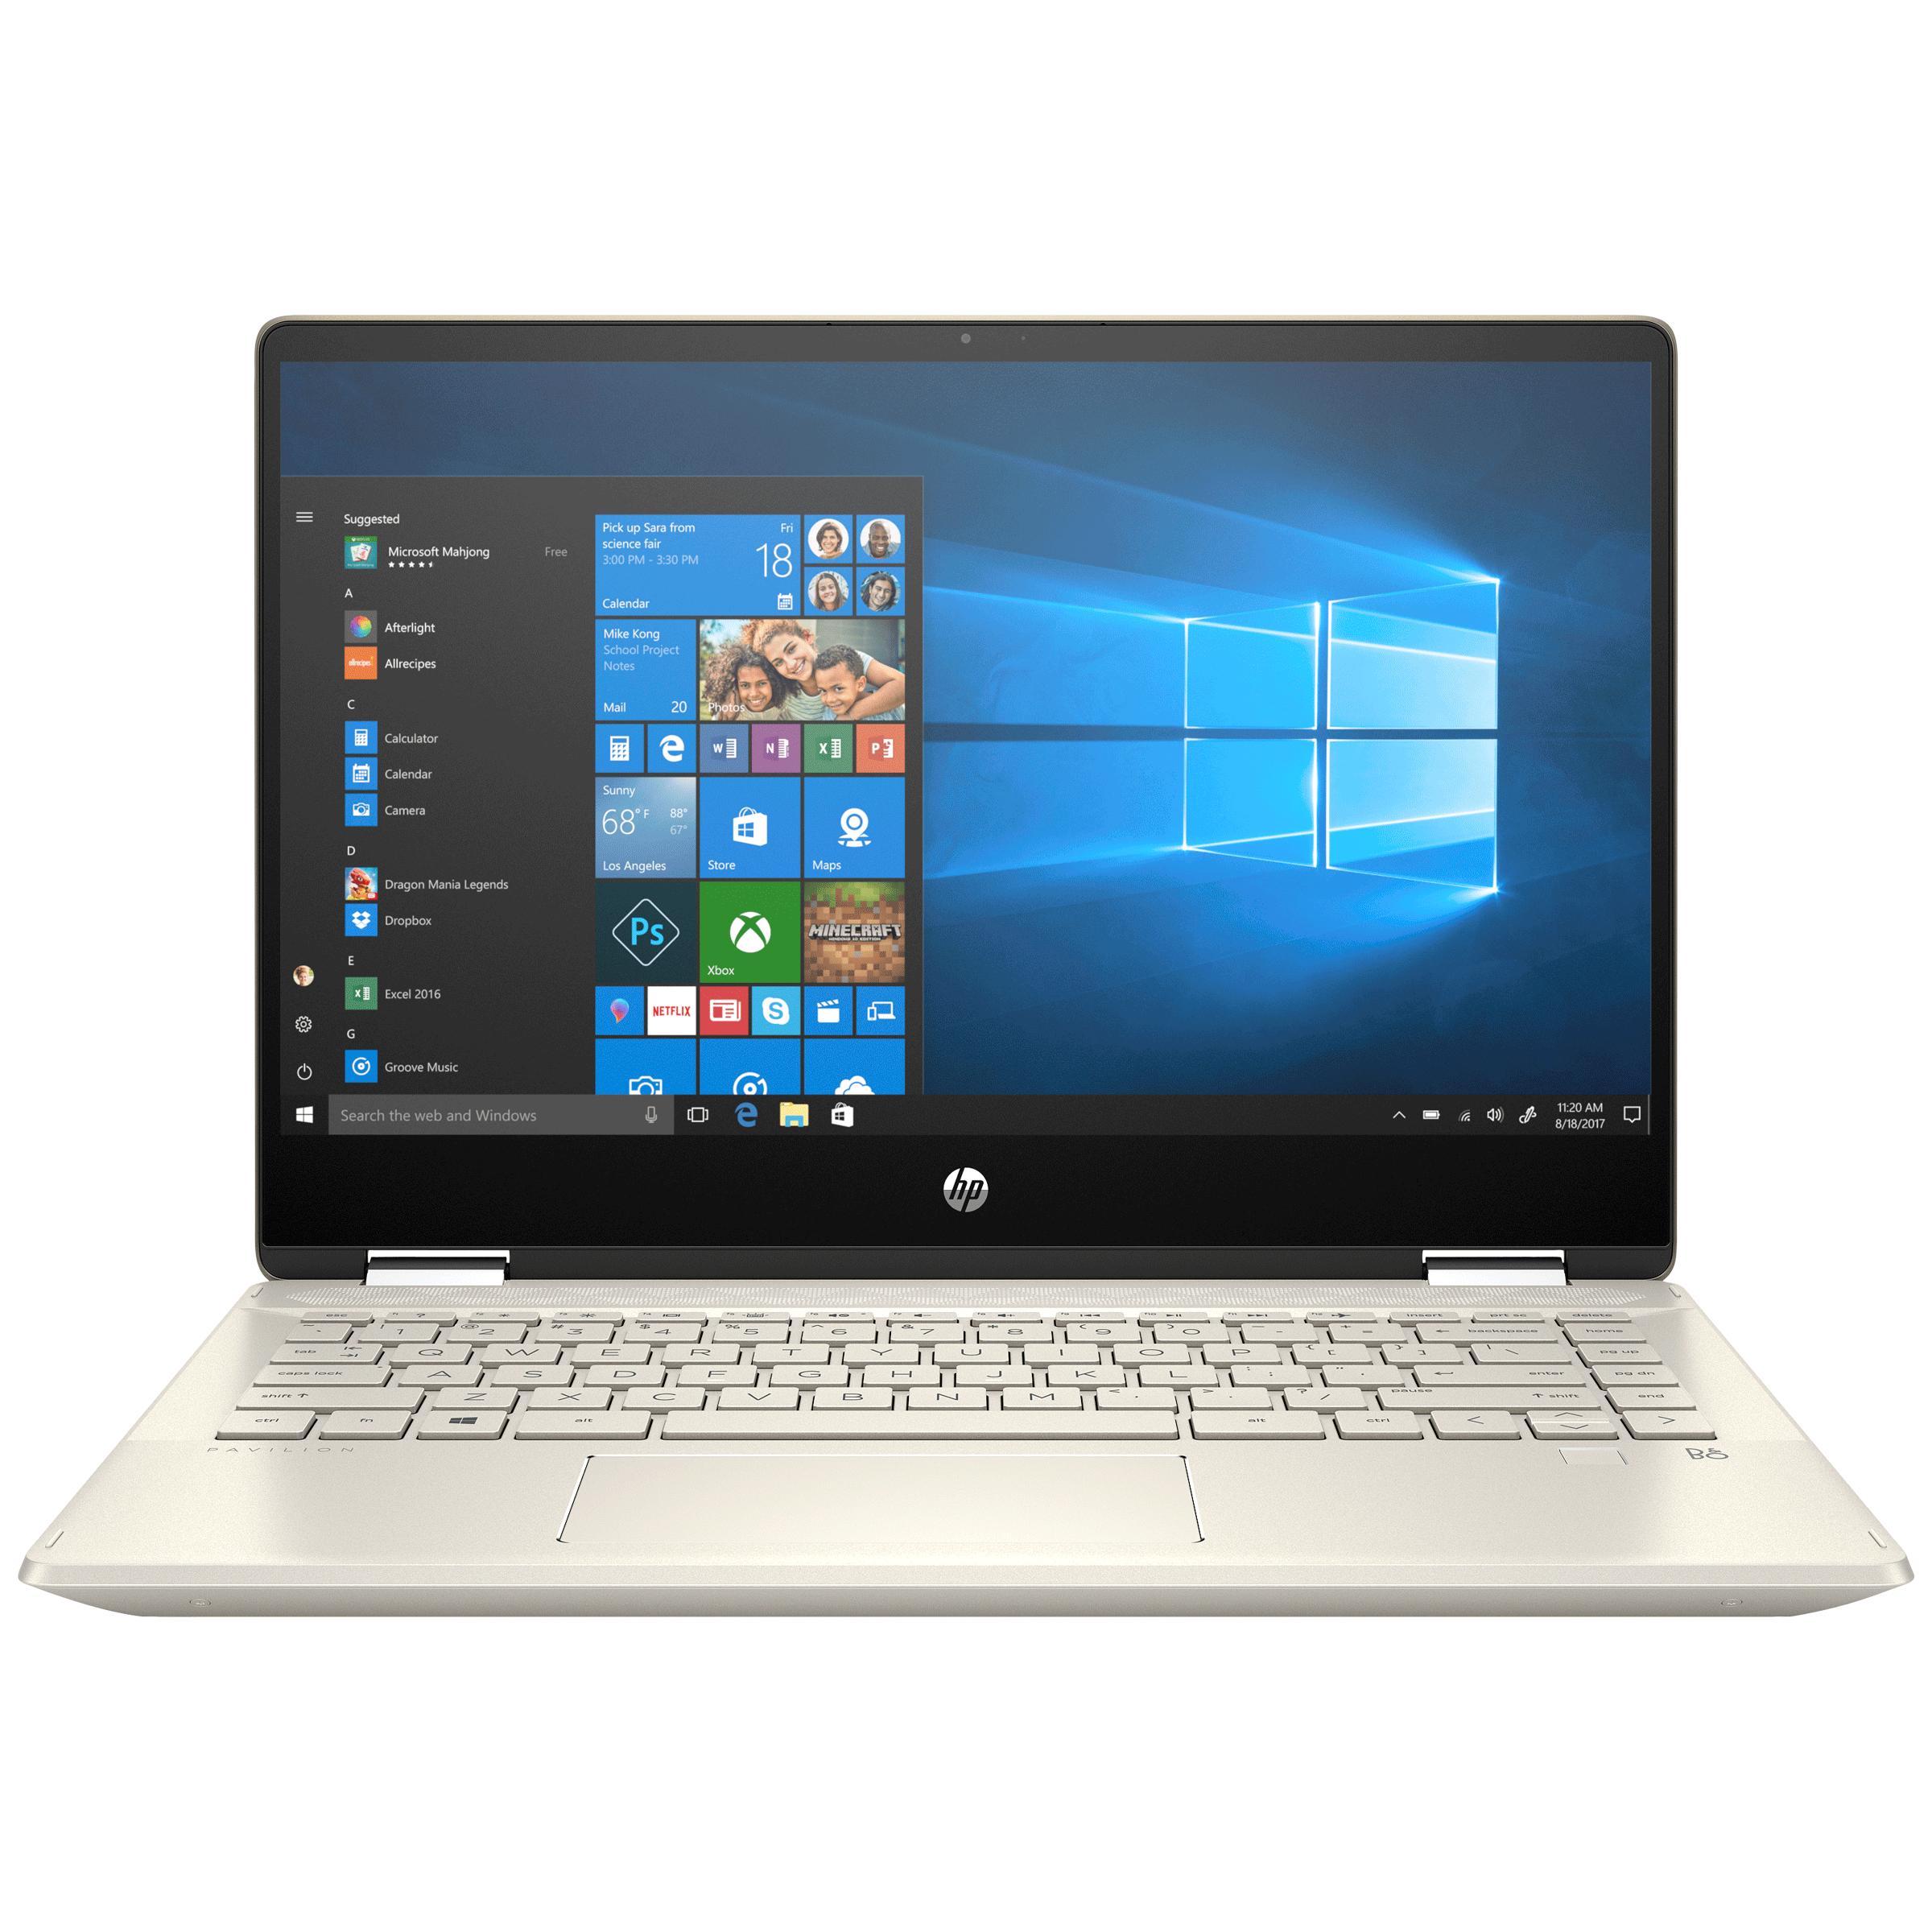 HP Pavilion x360 Convertible 14-dh1502TU (401S0PA#ACJ) Core i3 10th Gen Windows 10 Home 2-in-1 Laptop (8GB RAM, 512GB SSD, Intel UHD Graphics, MS Office, 35.56cm, Warm Gold)_1